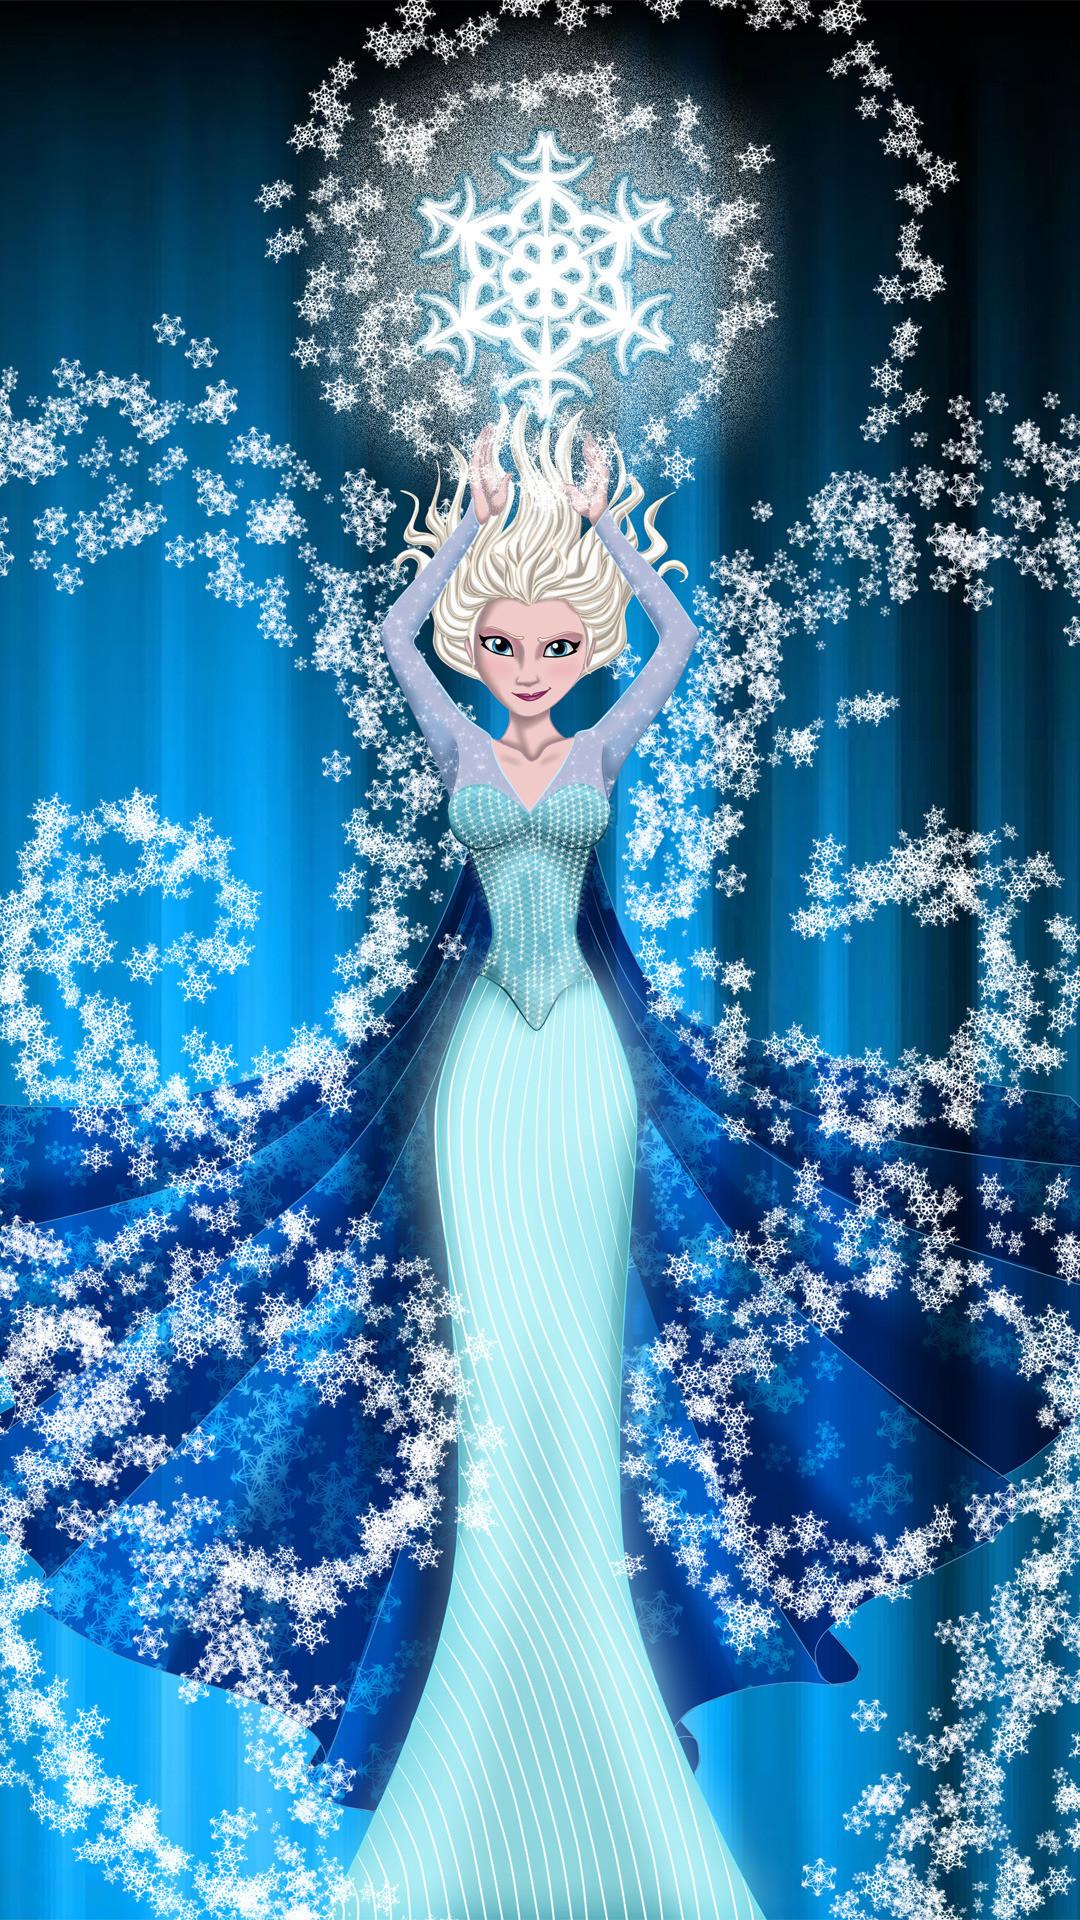 Frozen wallpaper 63 immagini for Frozen disegni